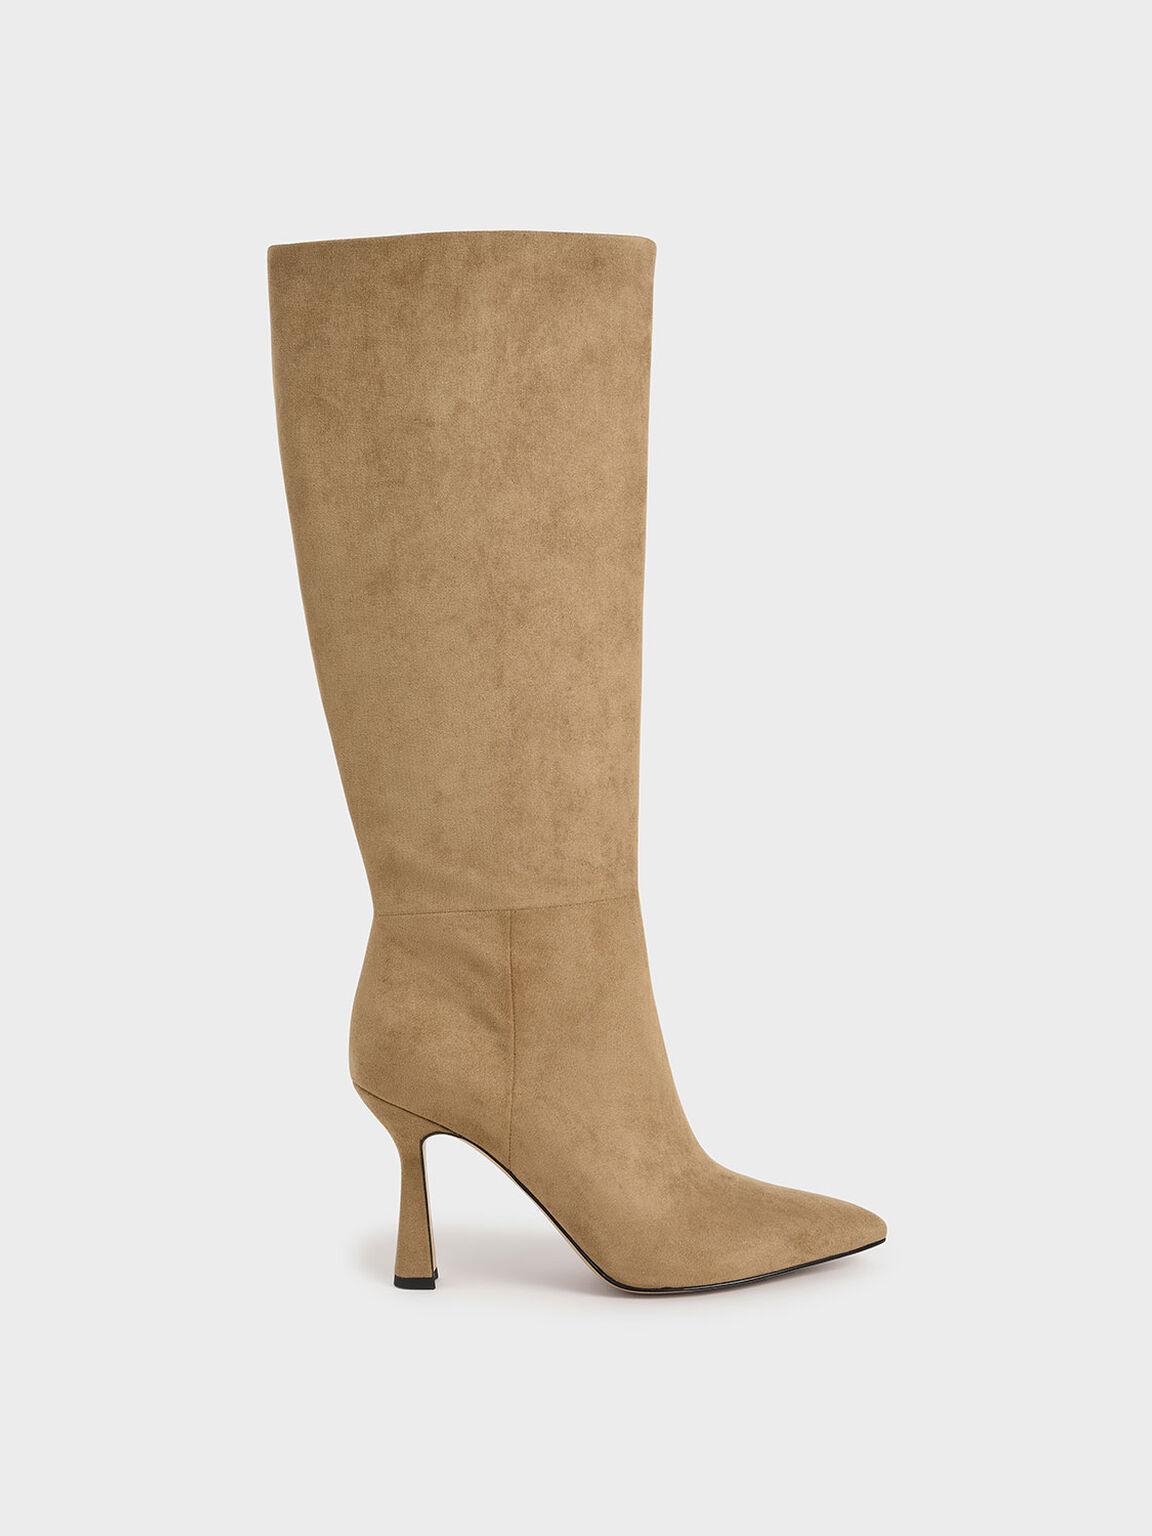 Textured Sculptural Heel Knee High Boots, Camel, hi-res